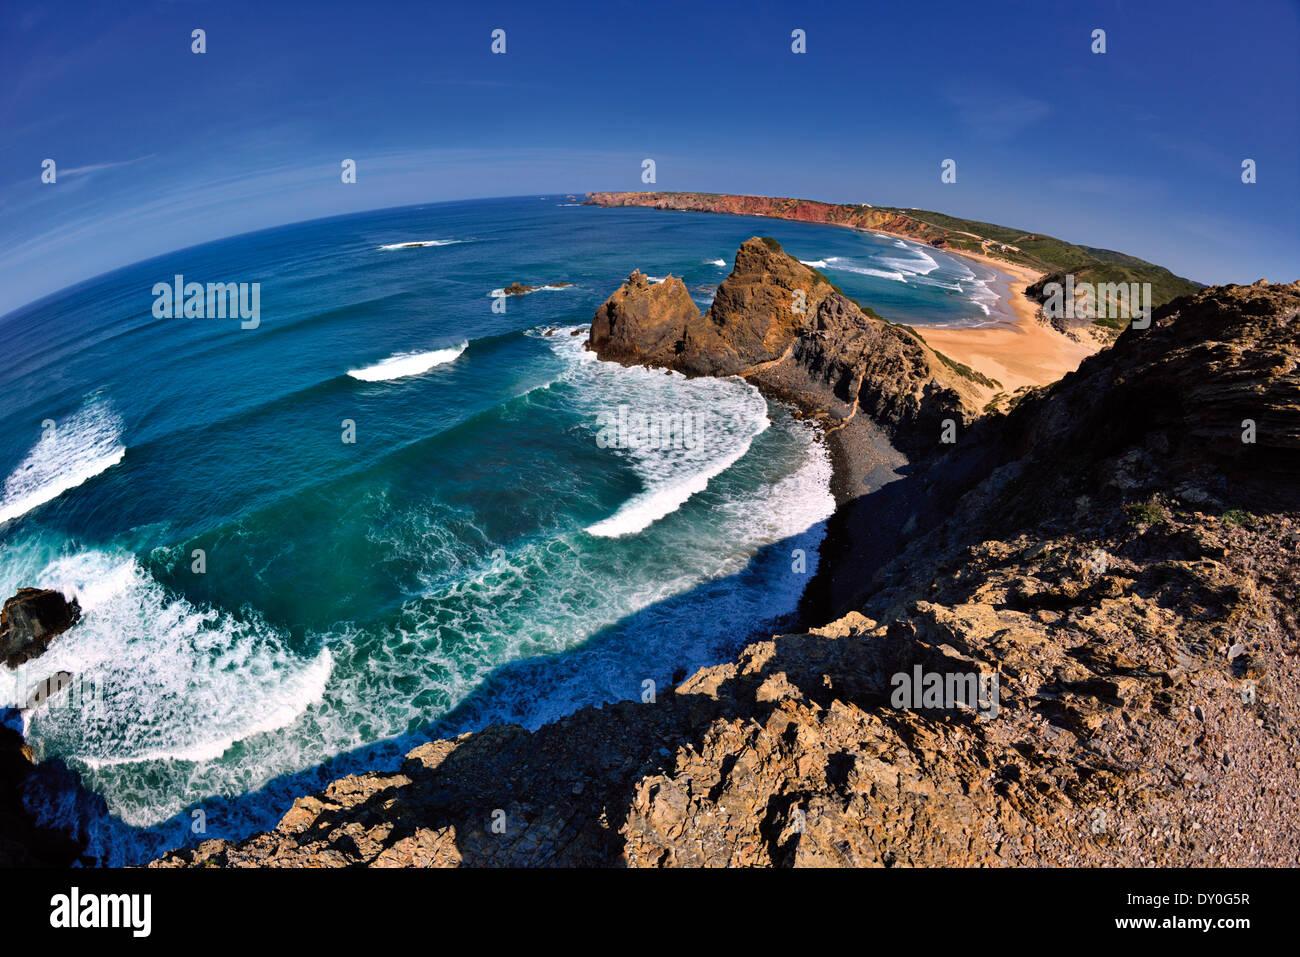 Portugal, Algarve: Fisheye view of the coast around Carrapateira - Stock Image